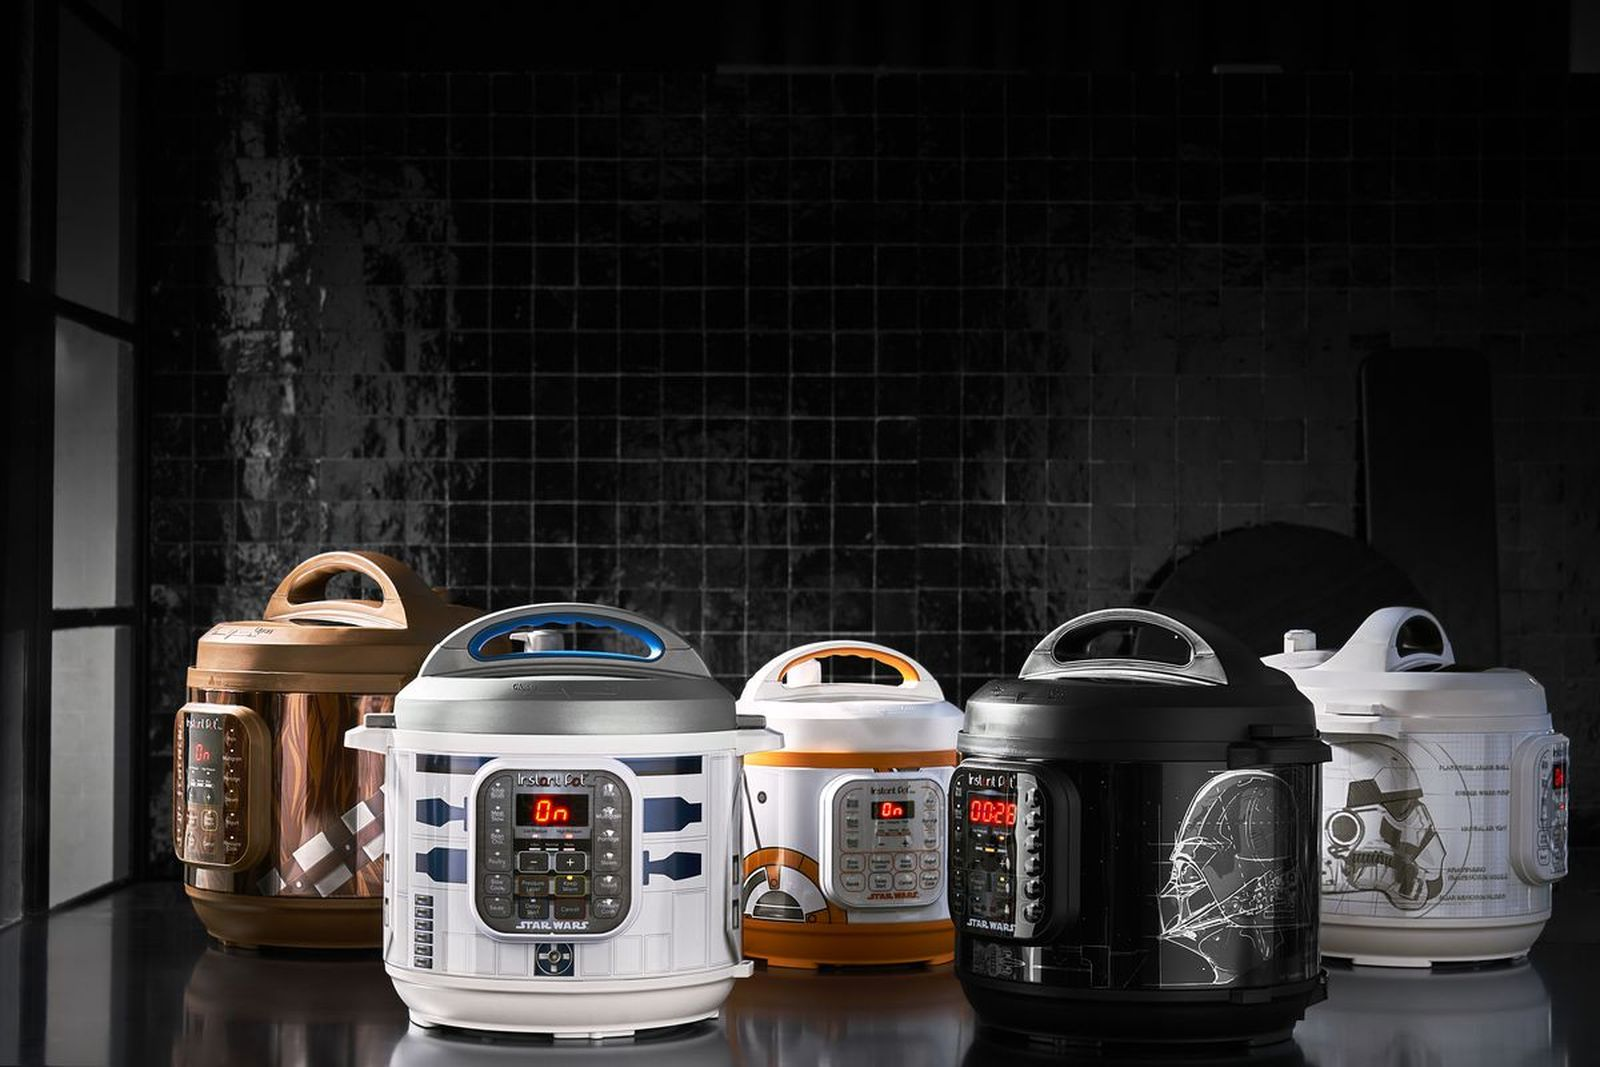 Star Wars Instant Pot